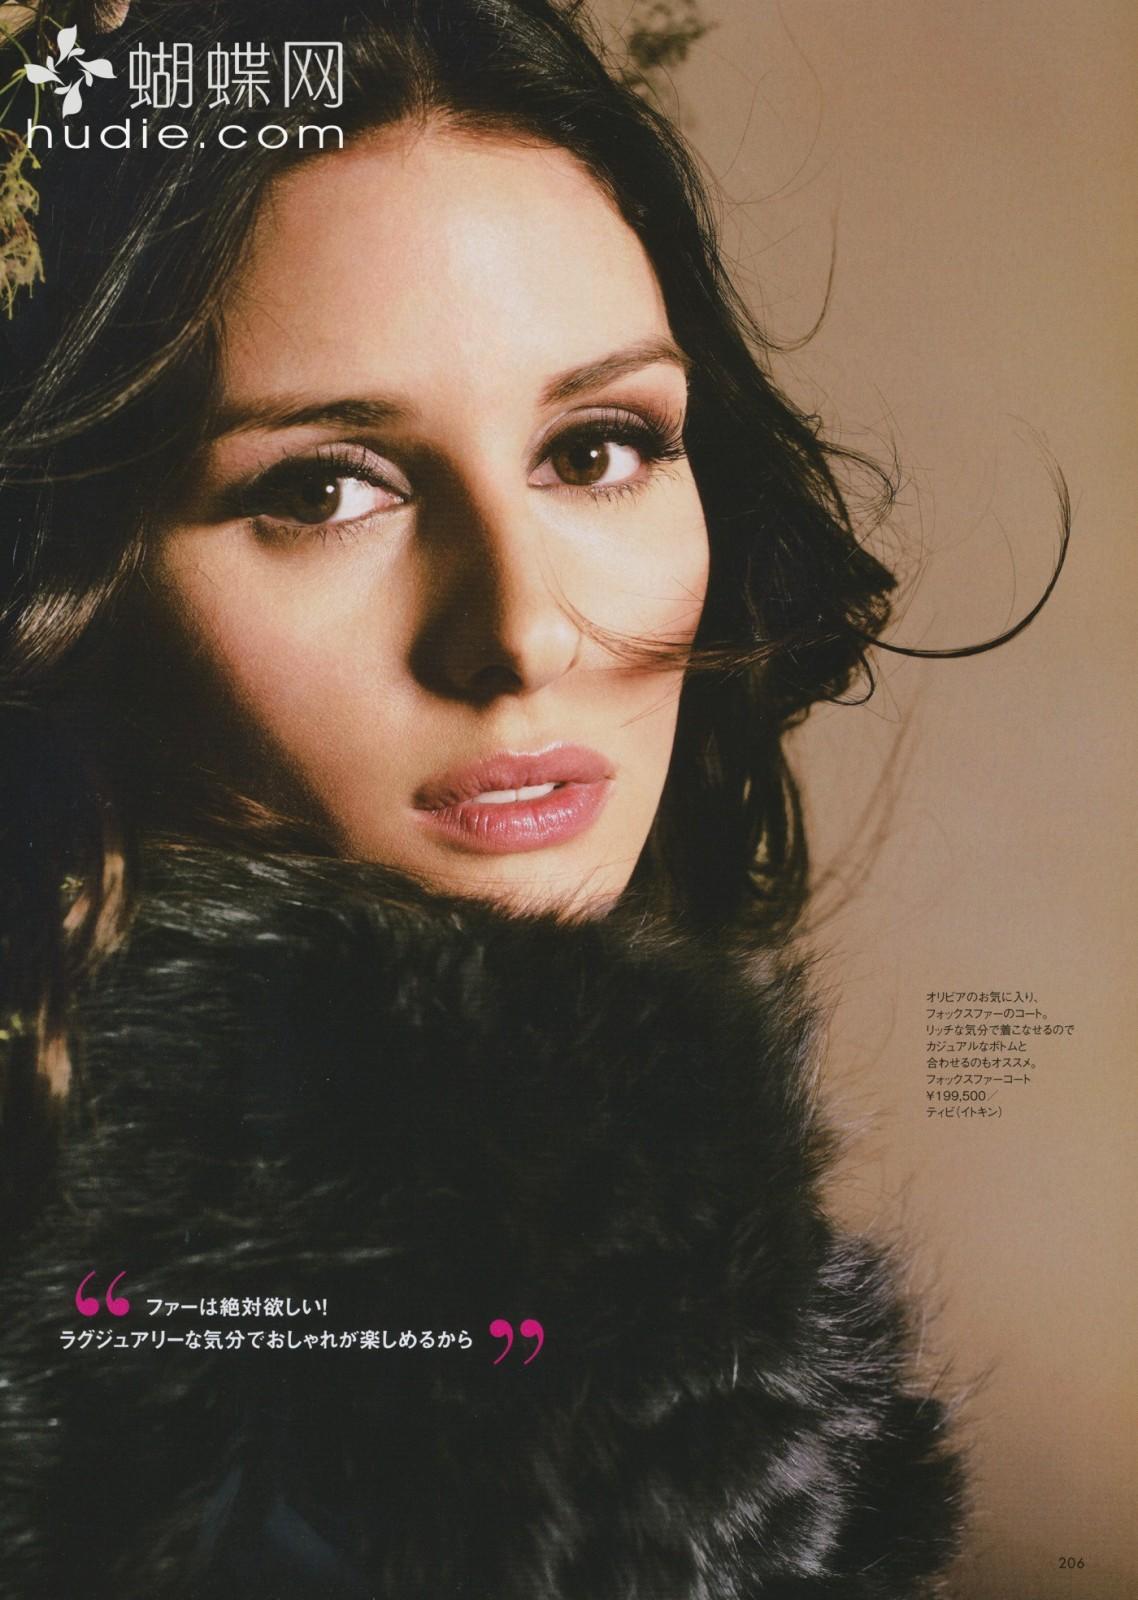 http://4.bp.blogspot.com/_GgQtqLiRv-8/TKHKH6dhCuI/AAAAAAAAxfU/z9rptKEIqws/s1600/Olivia-Elle-Japan-2.jpg